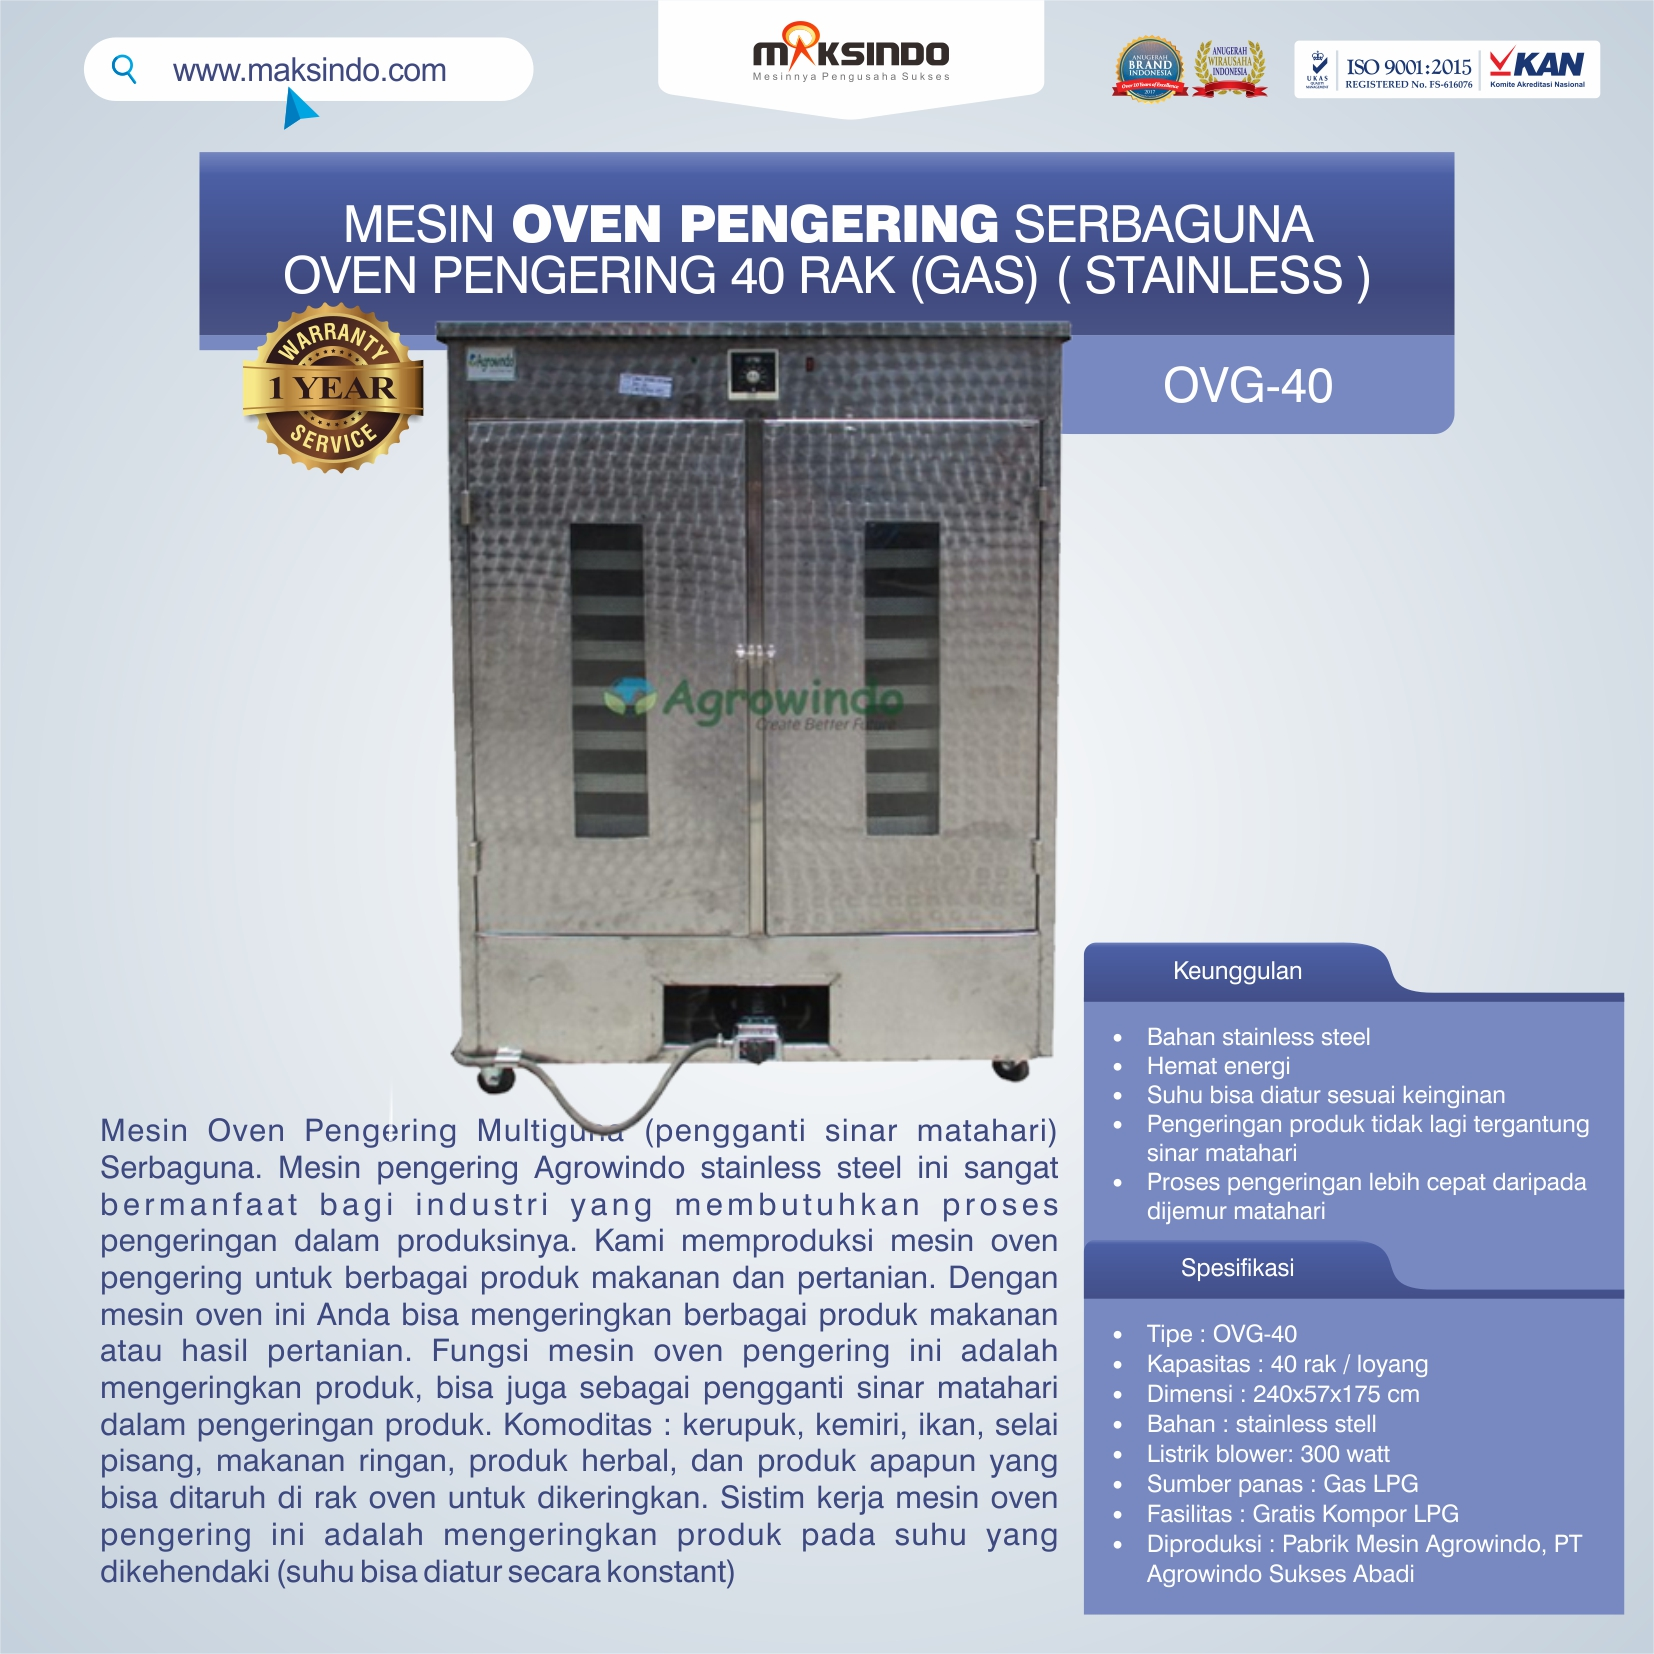 OVG-40 Mesin Oven Pengering Serbaguna 40 Rak (Gas) (Stainless )